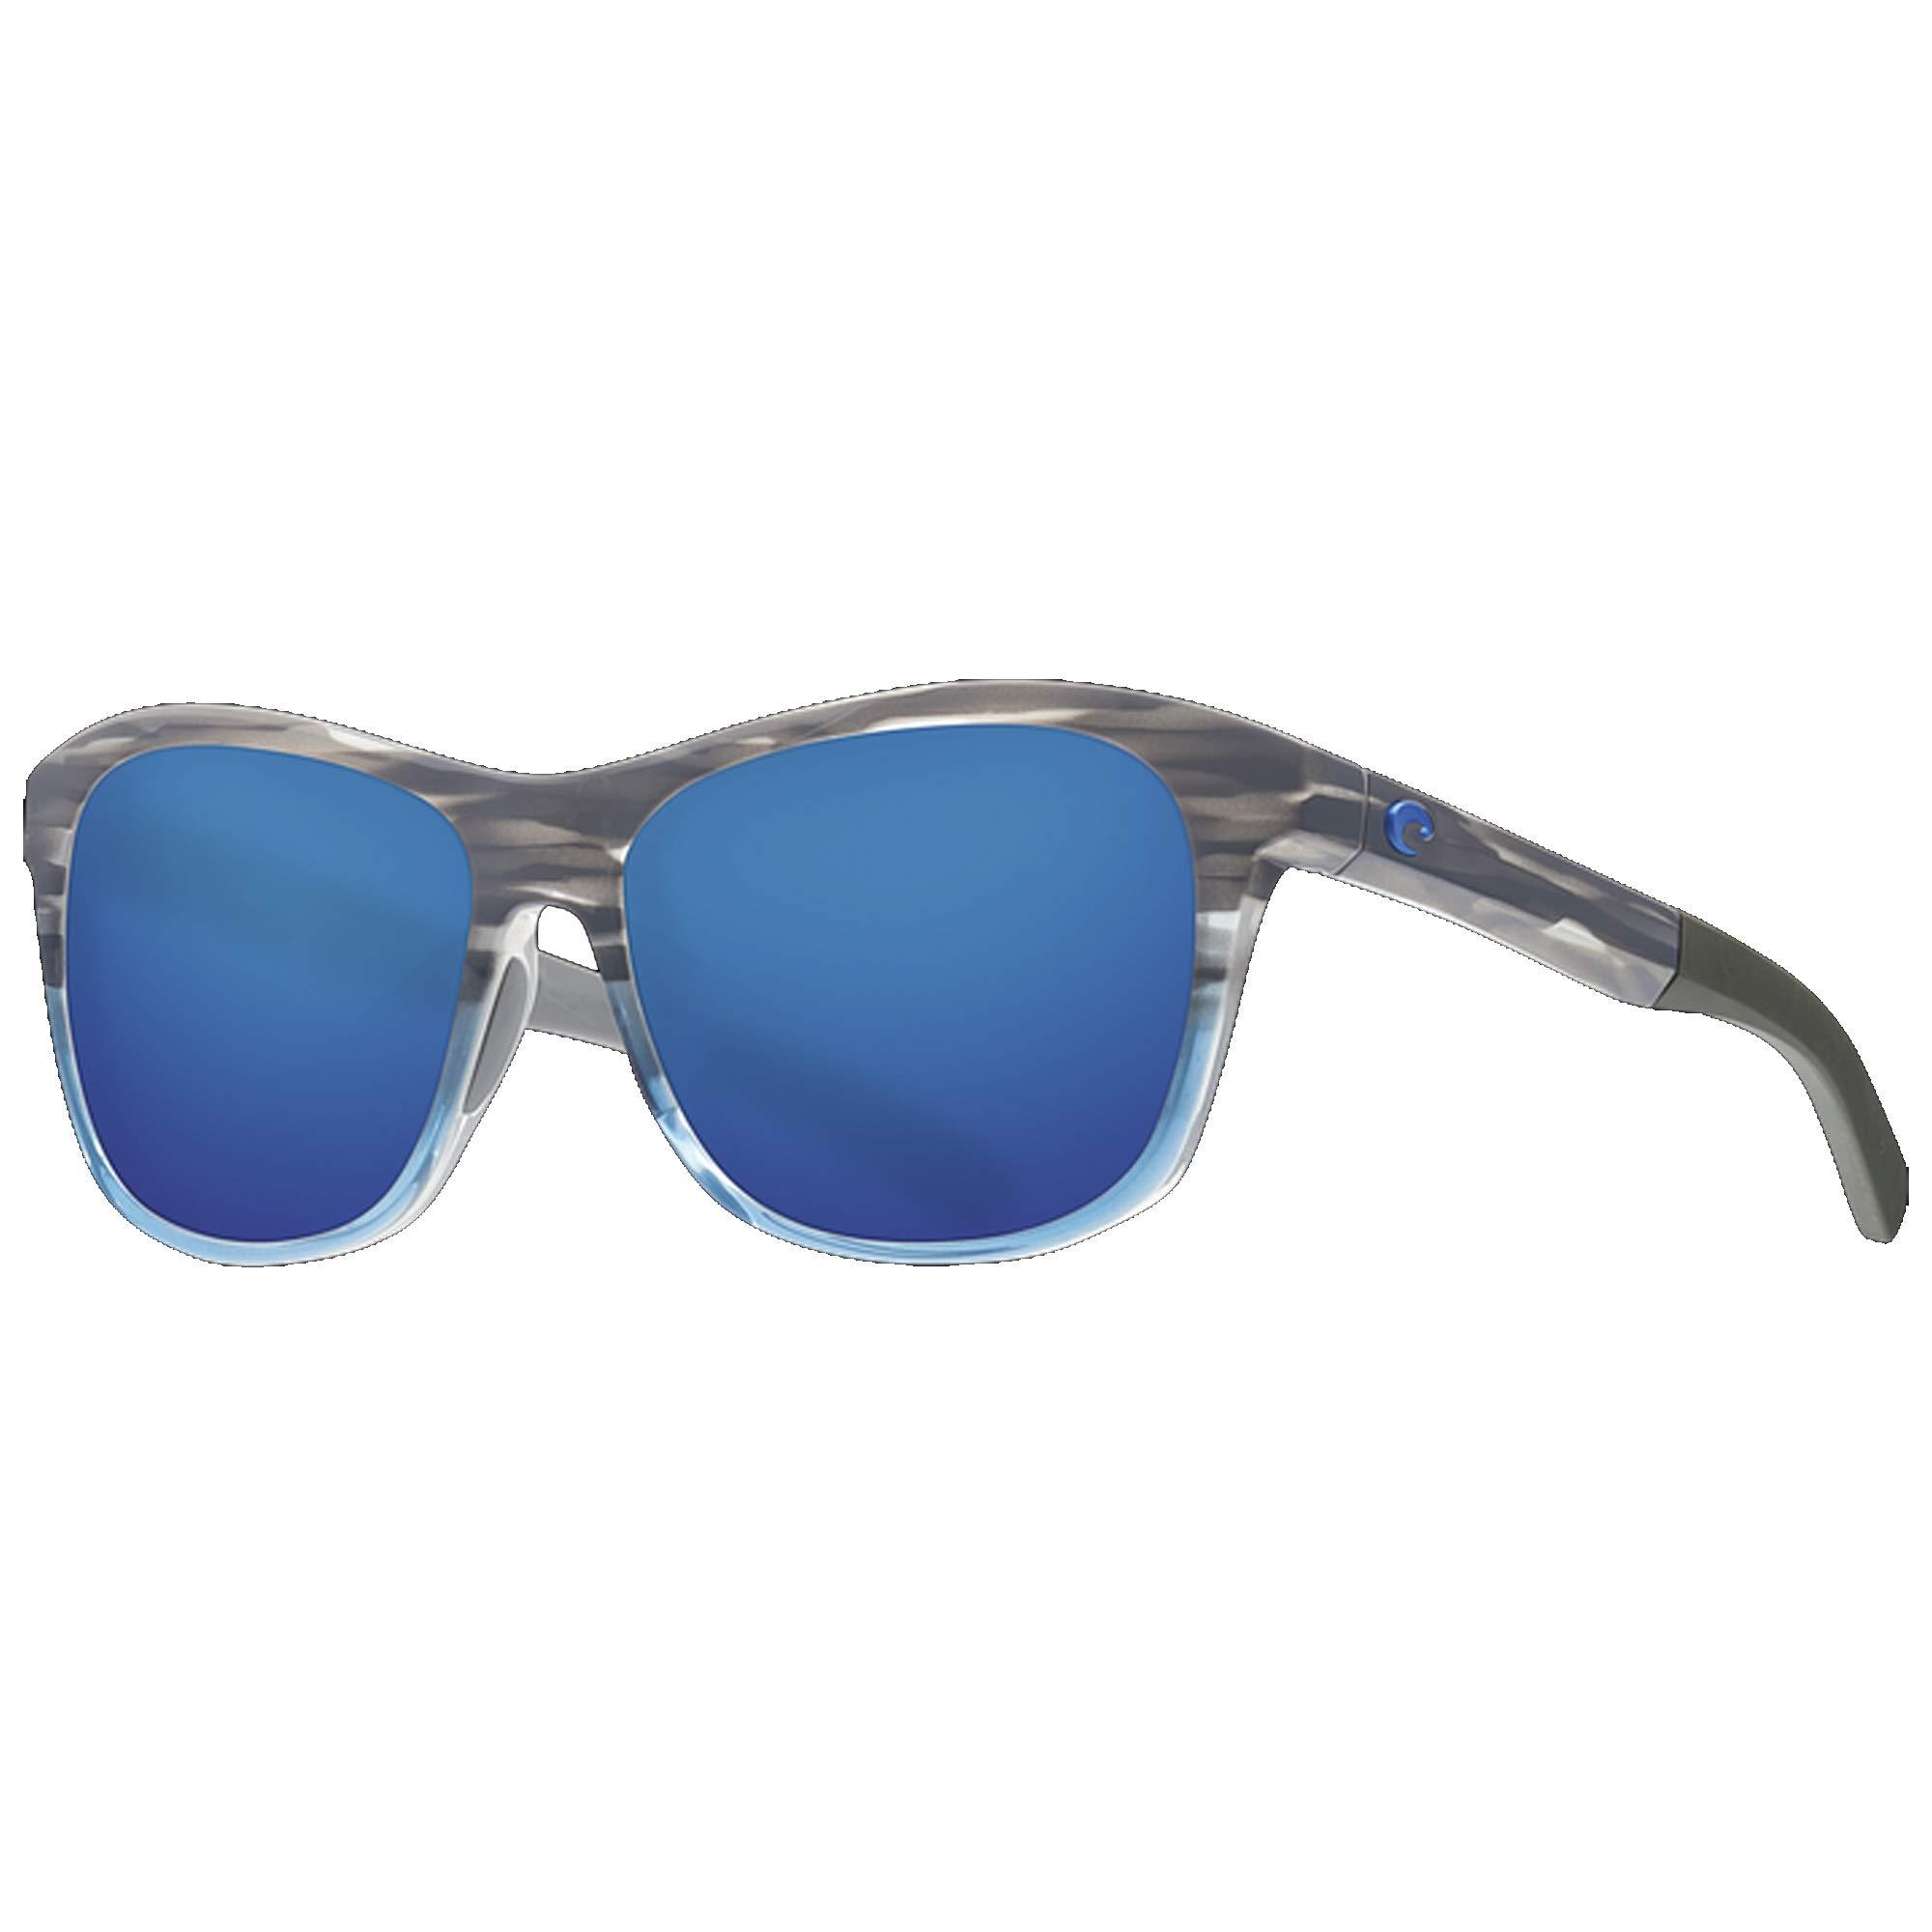 Costa Del Mar Ocearch Vela Sunglasses Shiny Coastal Fade/Blue Mirror 580Plastic by Costa Del Mar